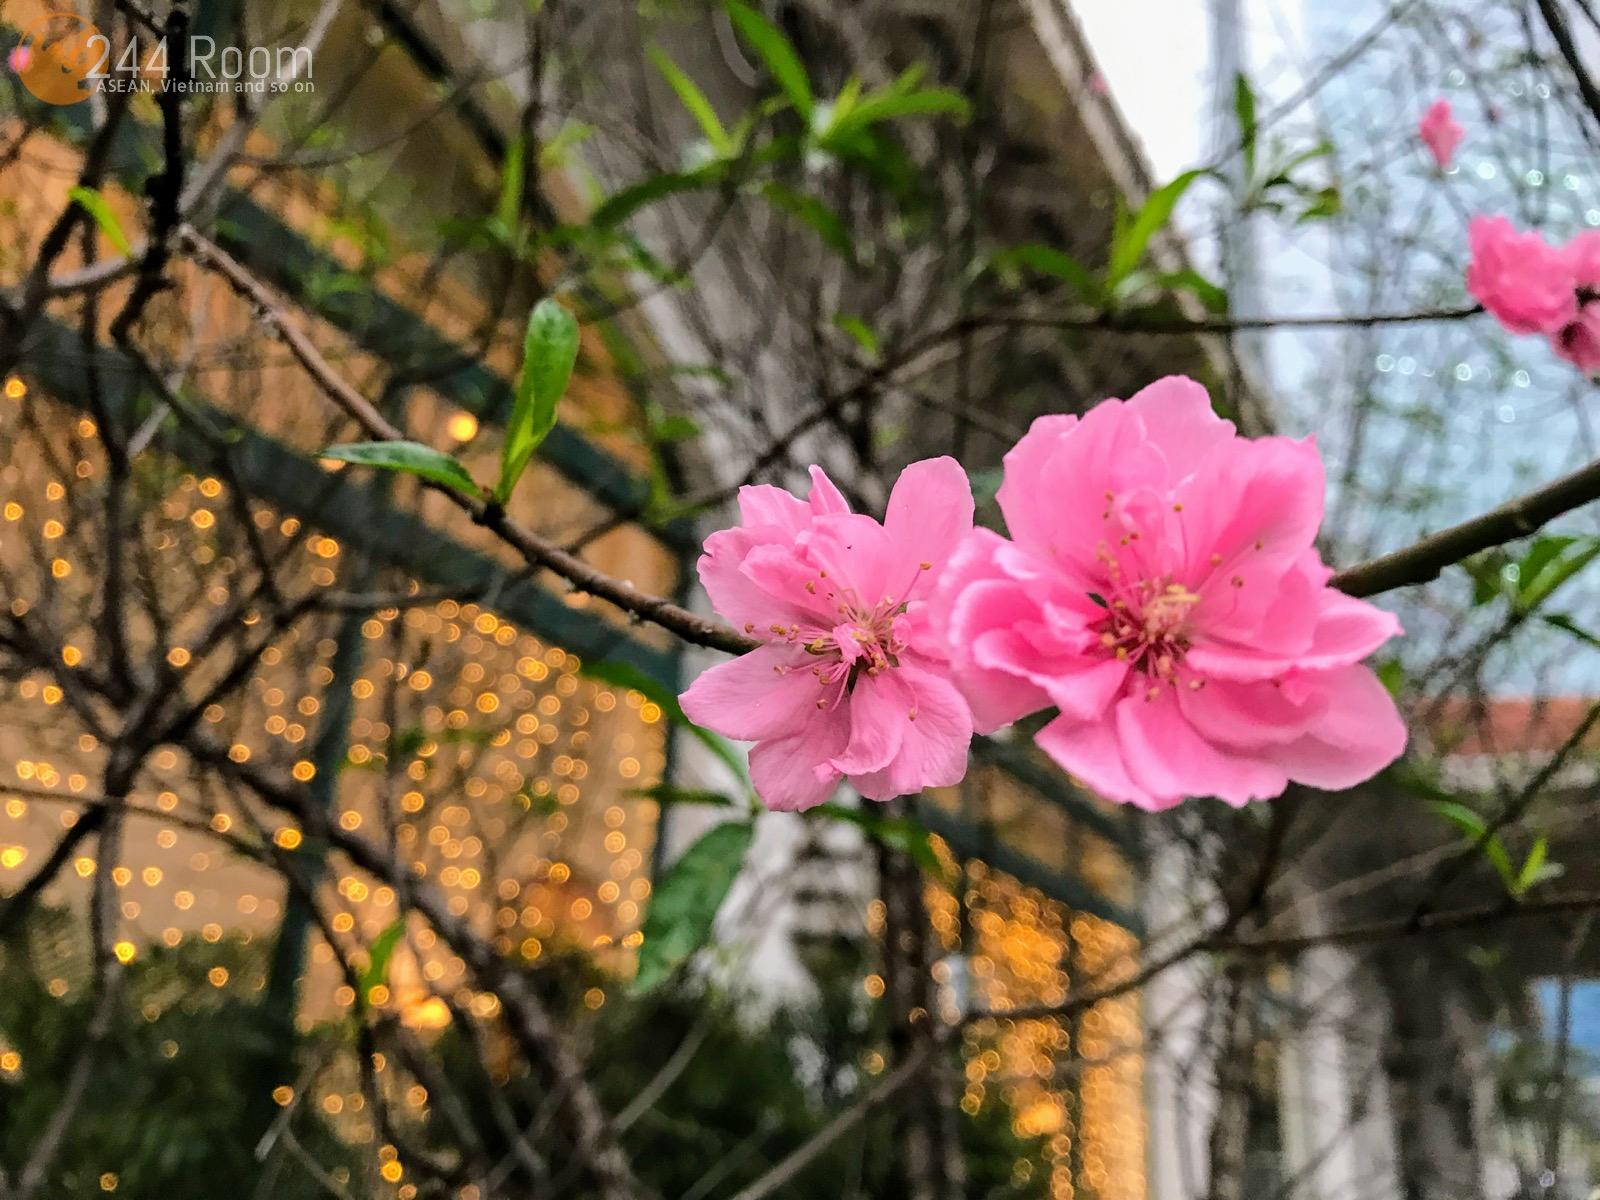 Peach-blossom-hanoi ハノイの桃の花2